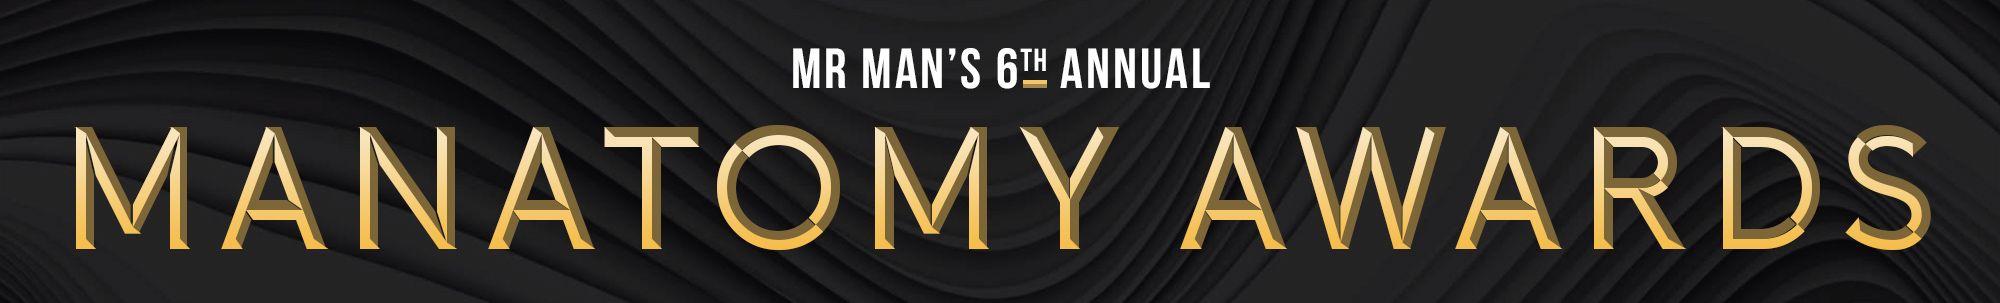 Manatomy Awards